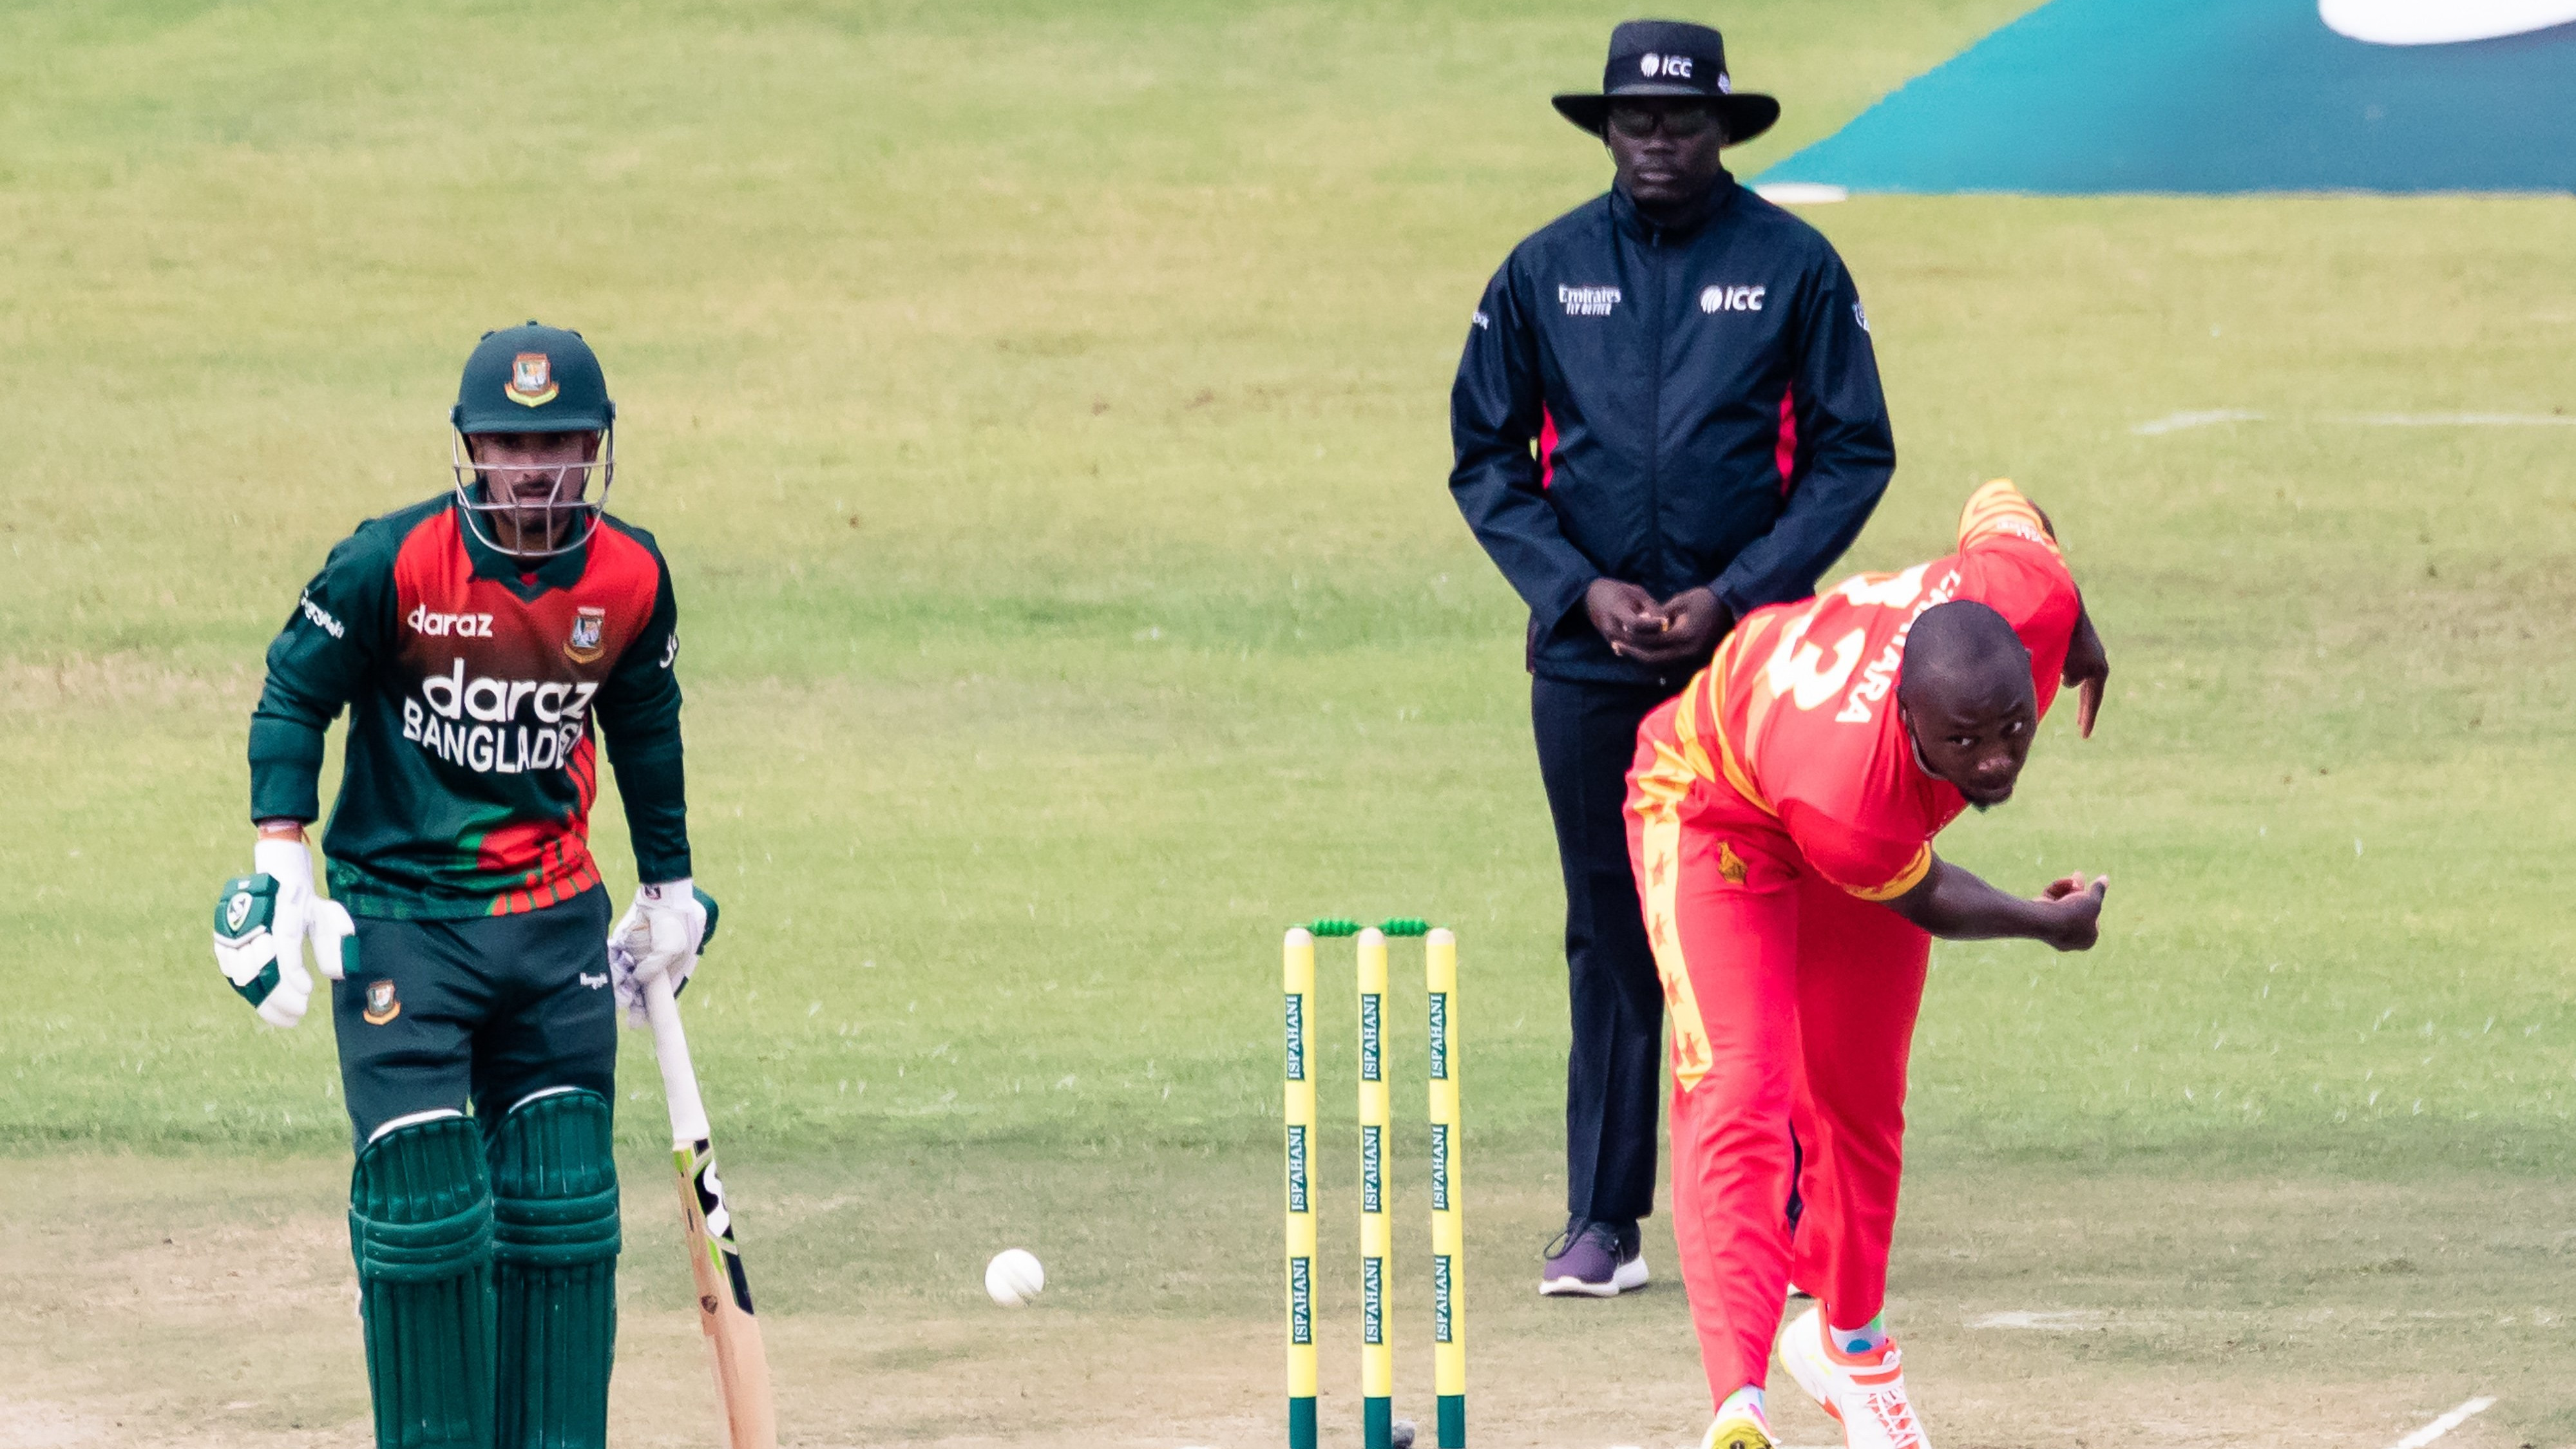 ZIM v BAN 2021: ZC and BCB agree to preponethree-match T20I series